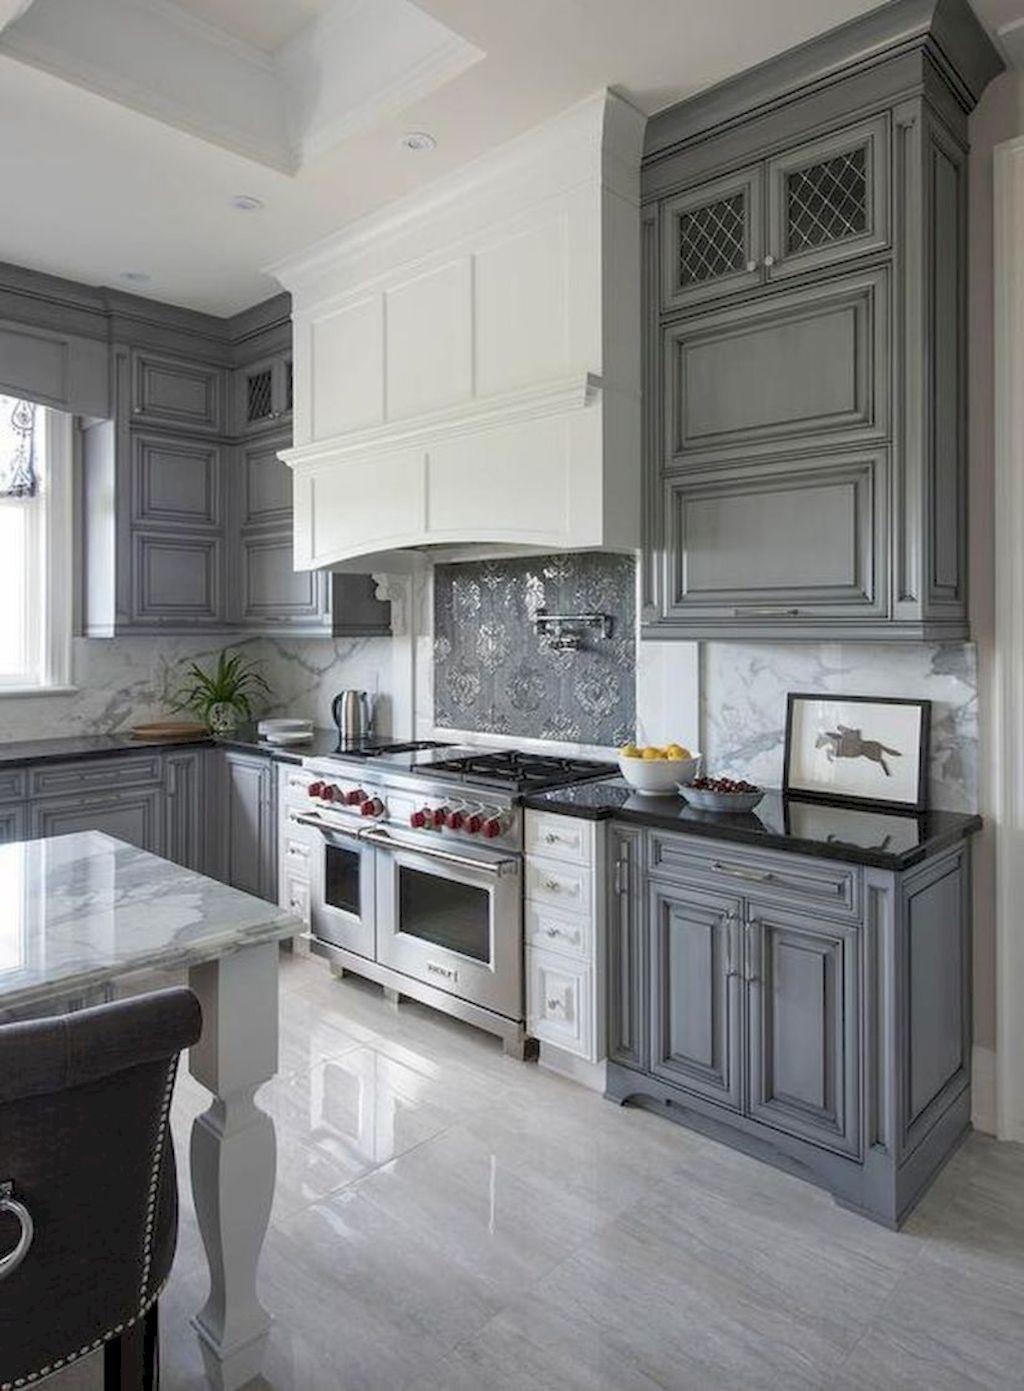 70 modern farmhouse kitchen cabinet and countertops ideas gray and white kitchen kitchen on farmhouse kitchen grey cabinets id=86760